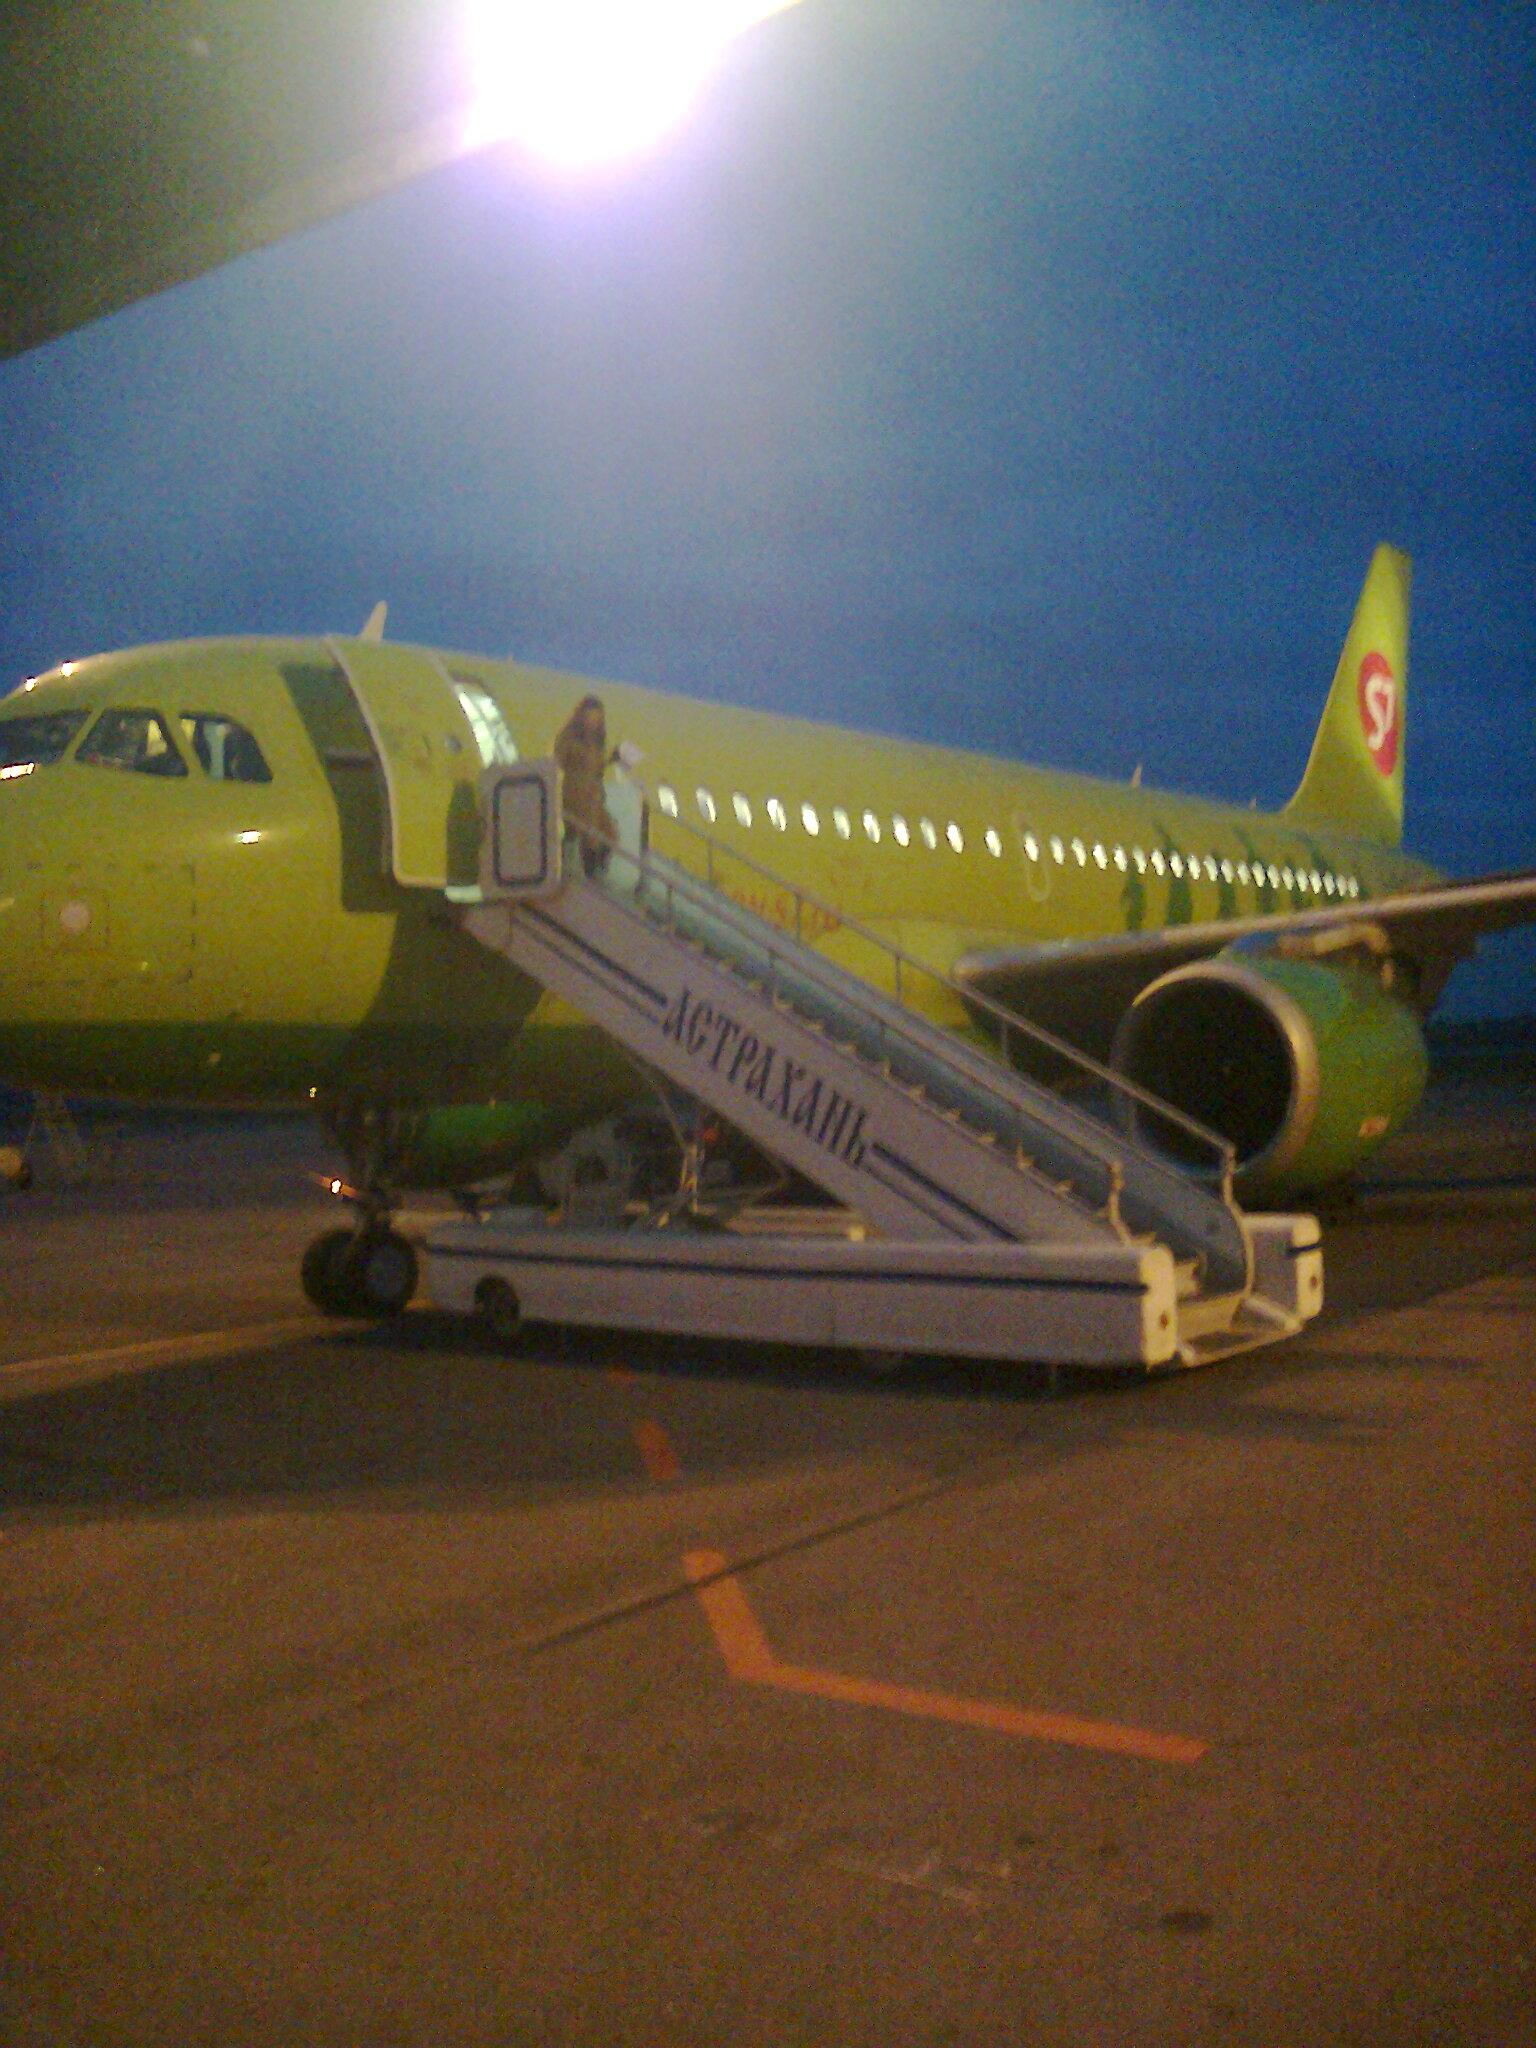 Самолет Airbus A319 S7 Airlines в аэропорту Астрахань